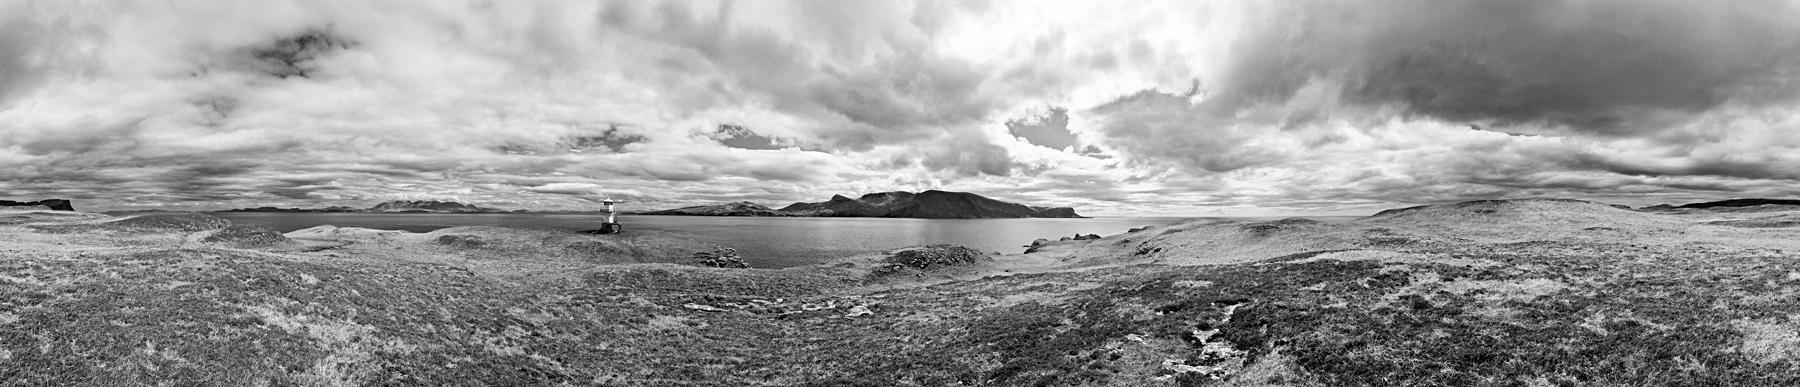 Isle of Canna / Schottland …